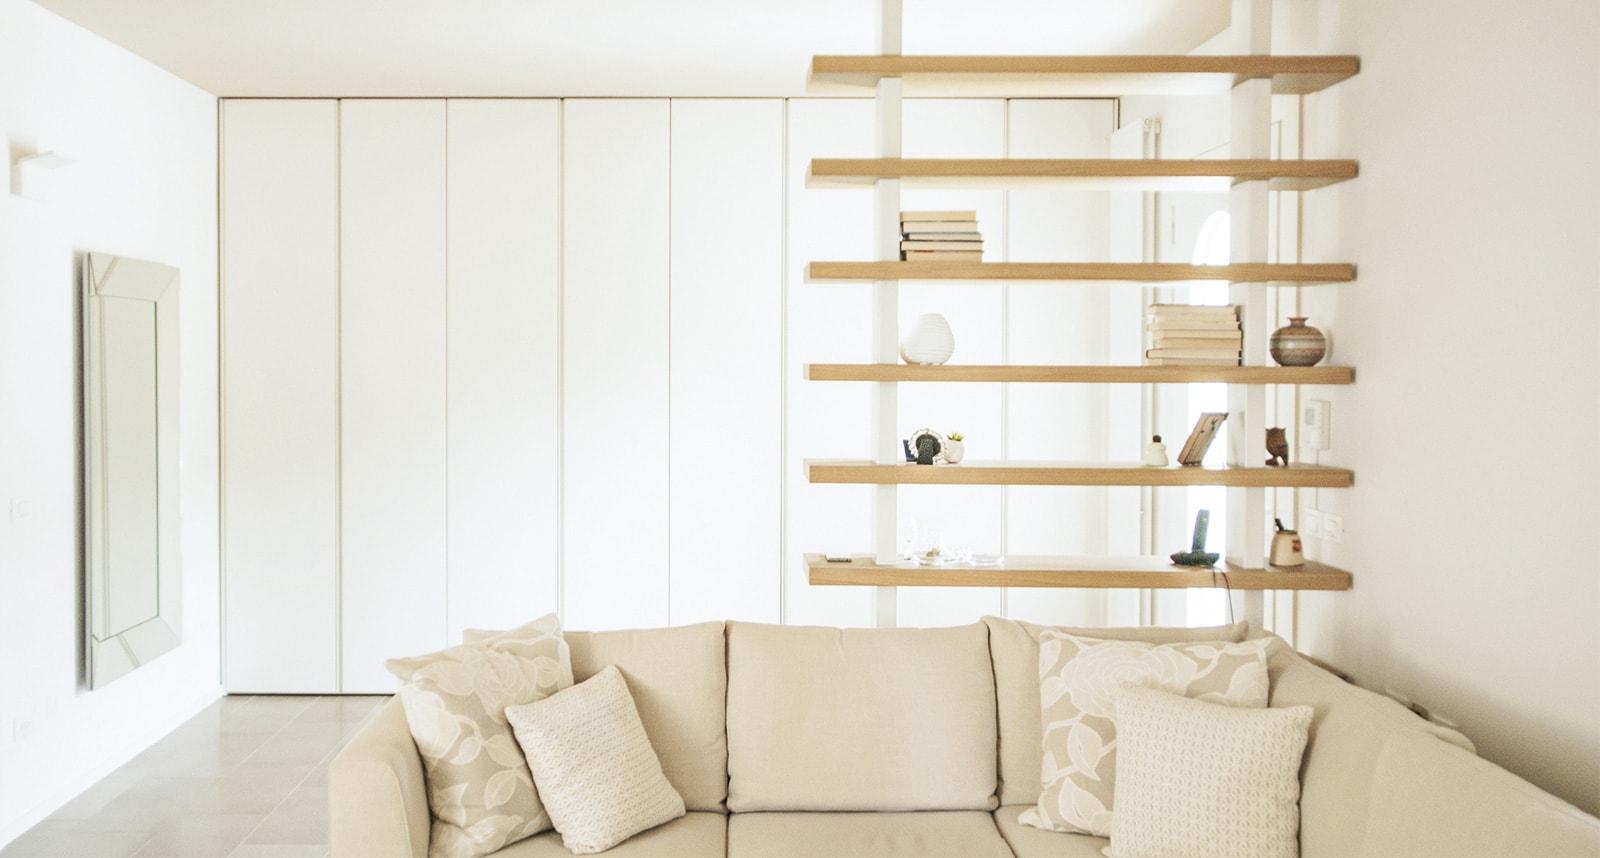 casa-giardino-via-berzuini-34-living-room